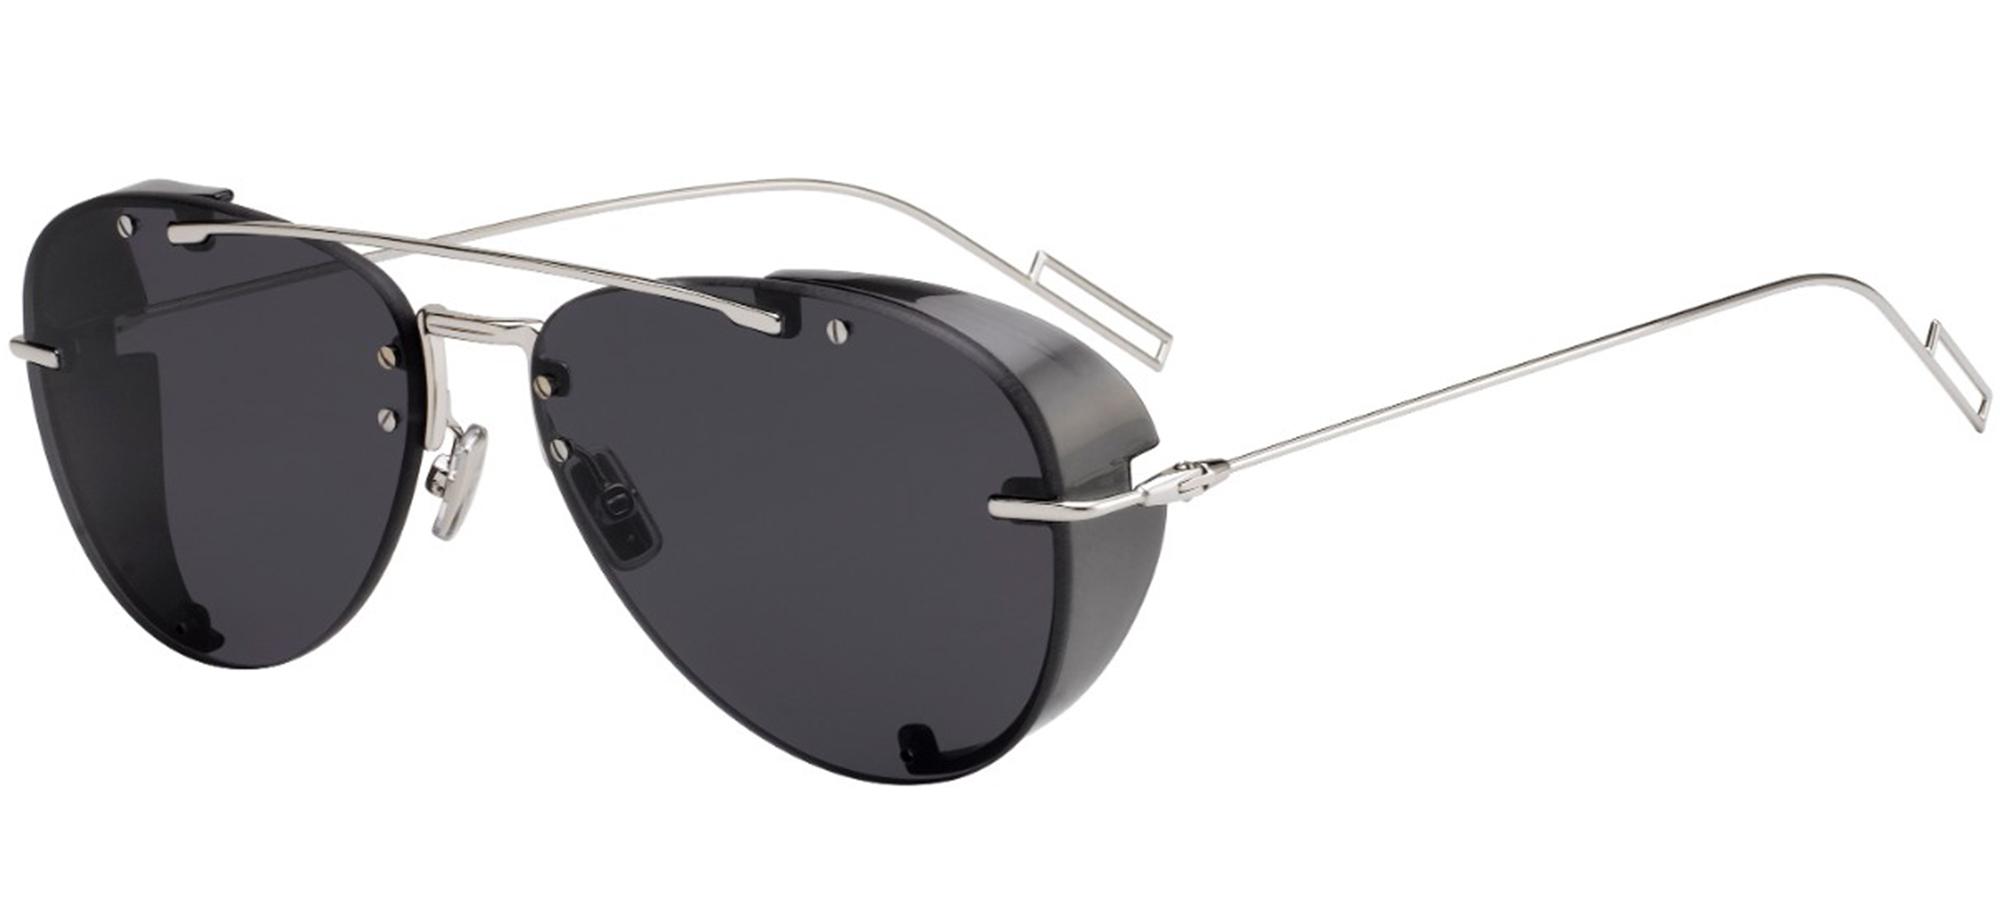 Dior Chroma 1 men Sunglasses online sale